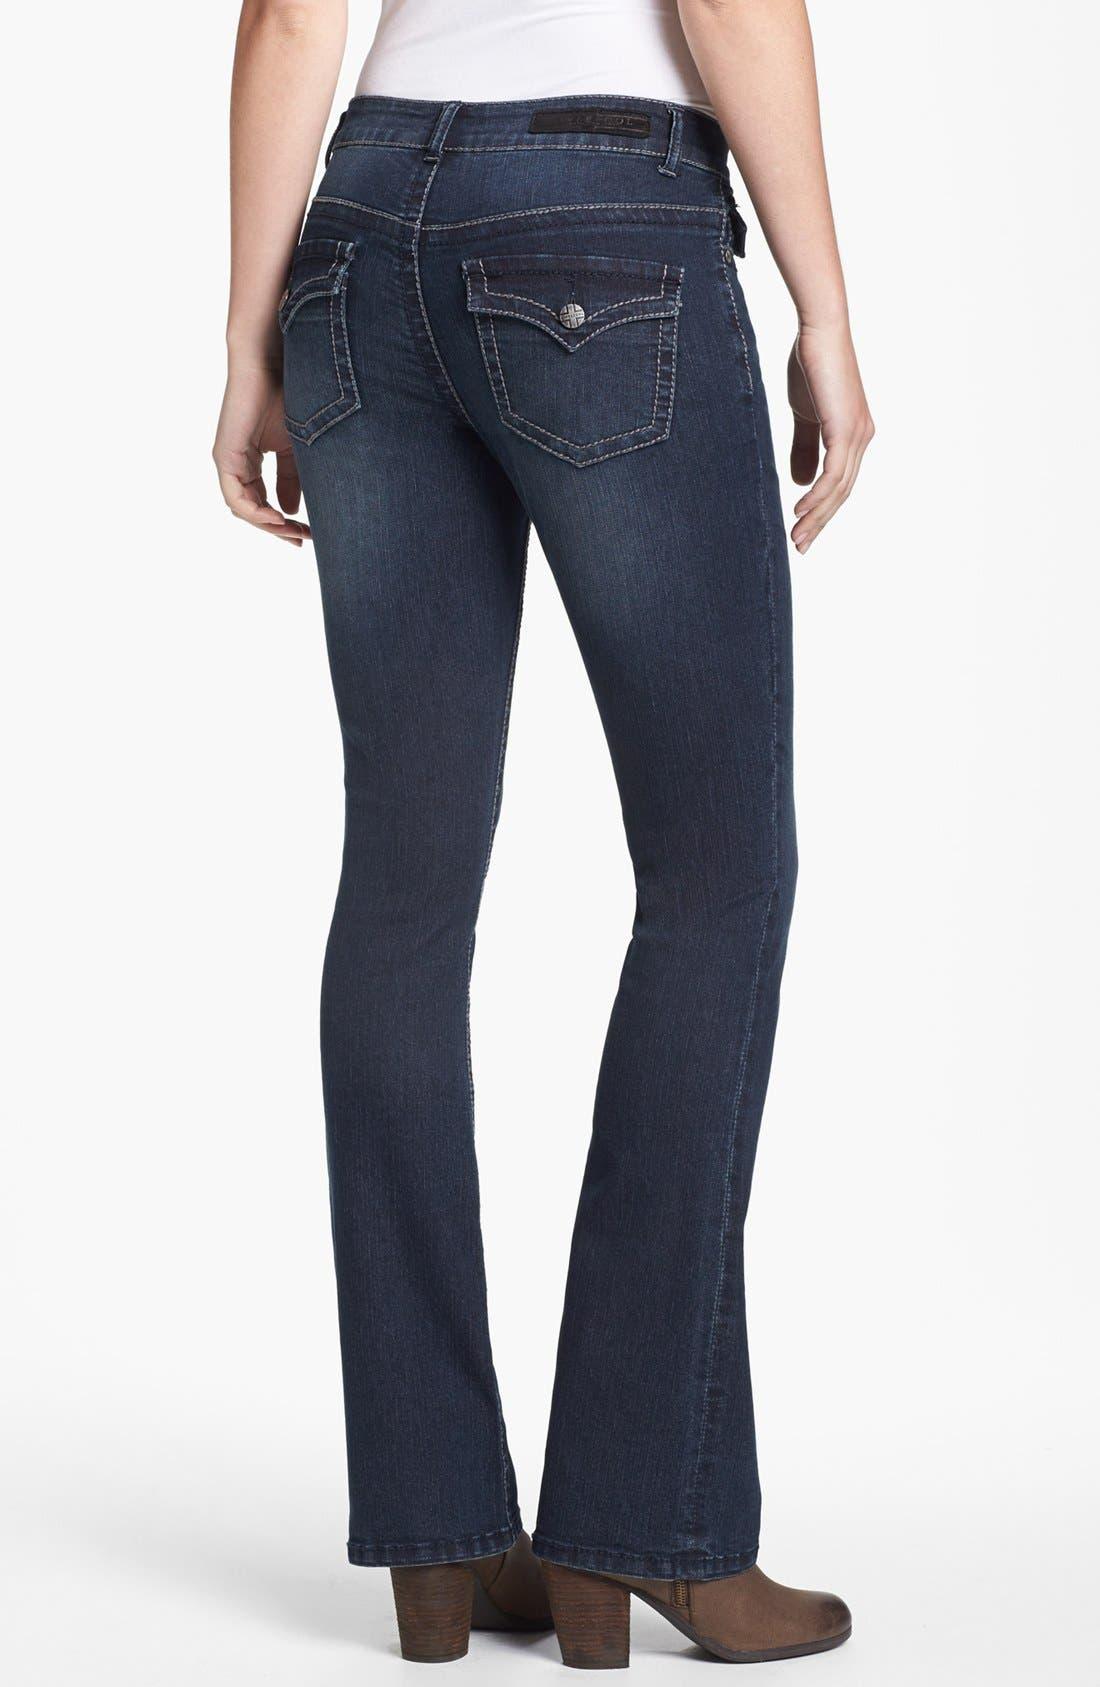 Alternate Image 2  - Liverpool Jeans Company 'Rita' Flap Pocket Stretch Bootcut Jeans